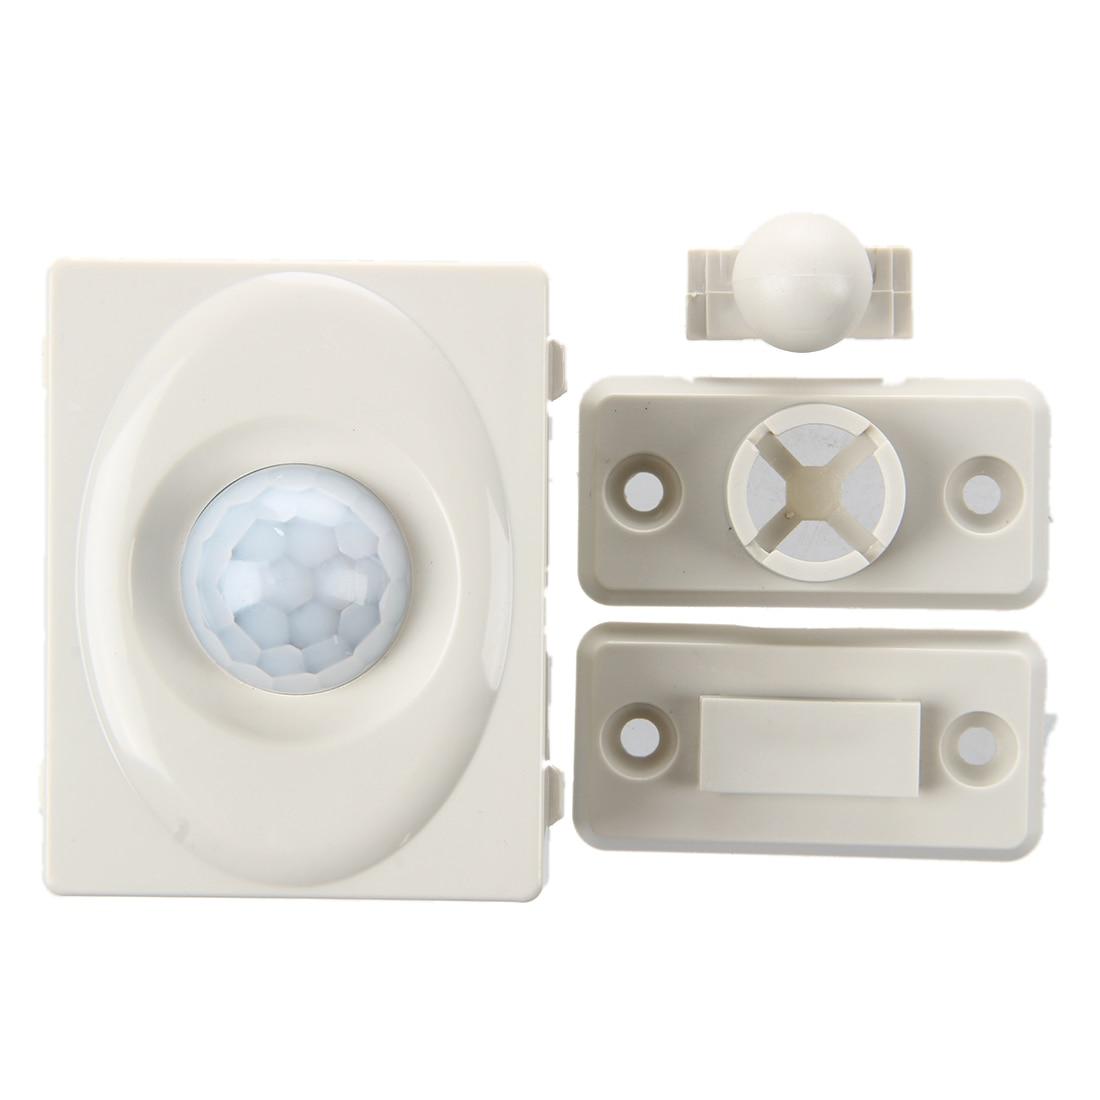 TD 12V IR Infrared Motion Sensor Automatic light switch for LED light energy saving 1x led night light lamps motion sensor nightlight pir intelligent led human body motion induction lamp energy saving lighting